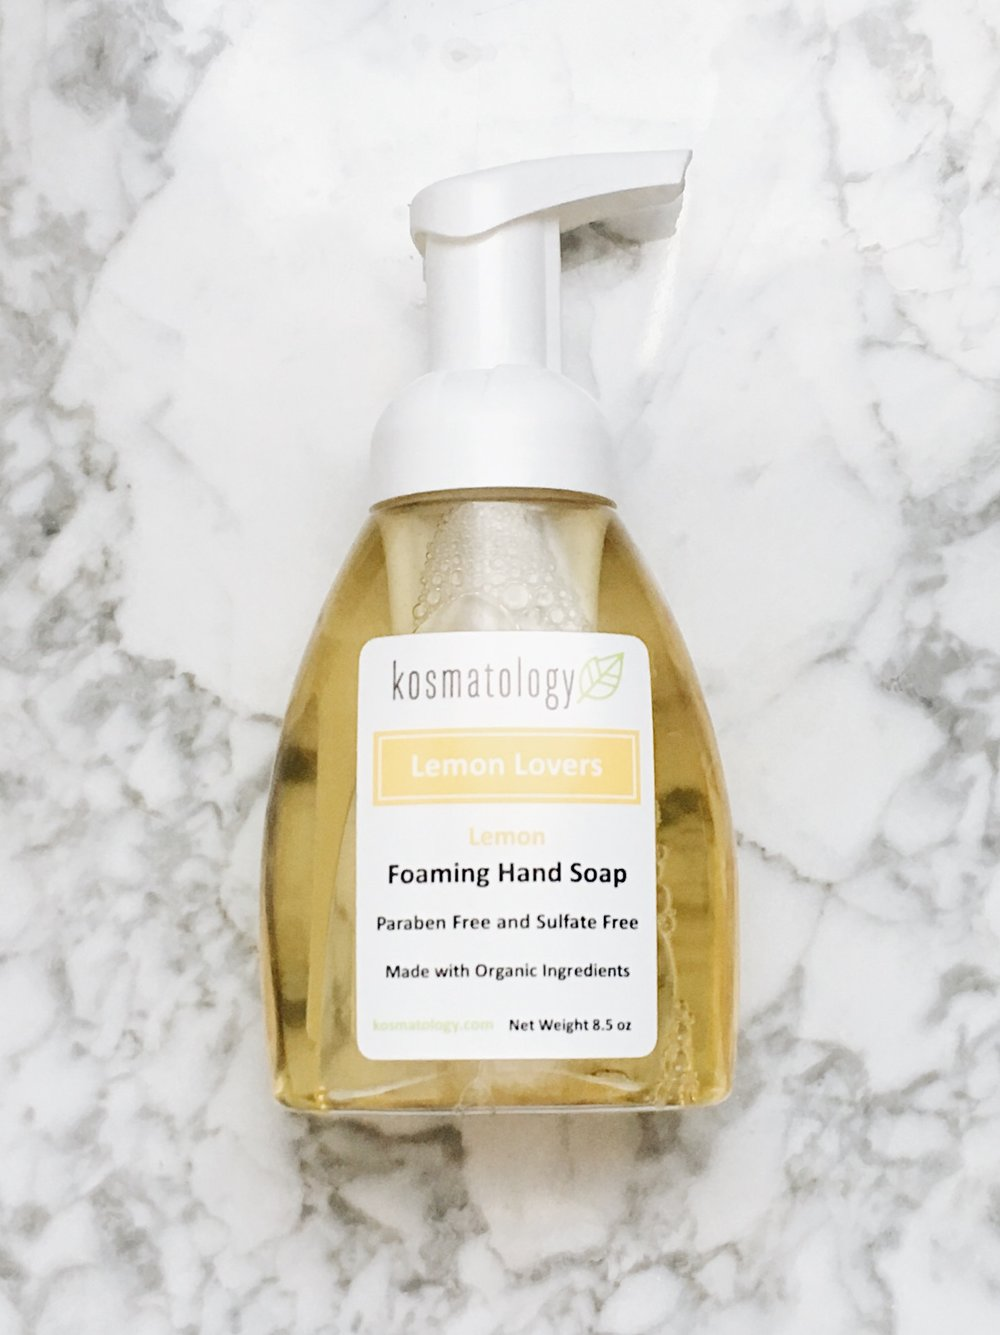 """Lemon Lovers"" Hand Soap by Kosmatology"